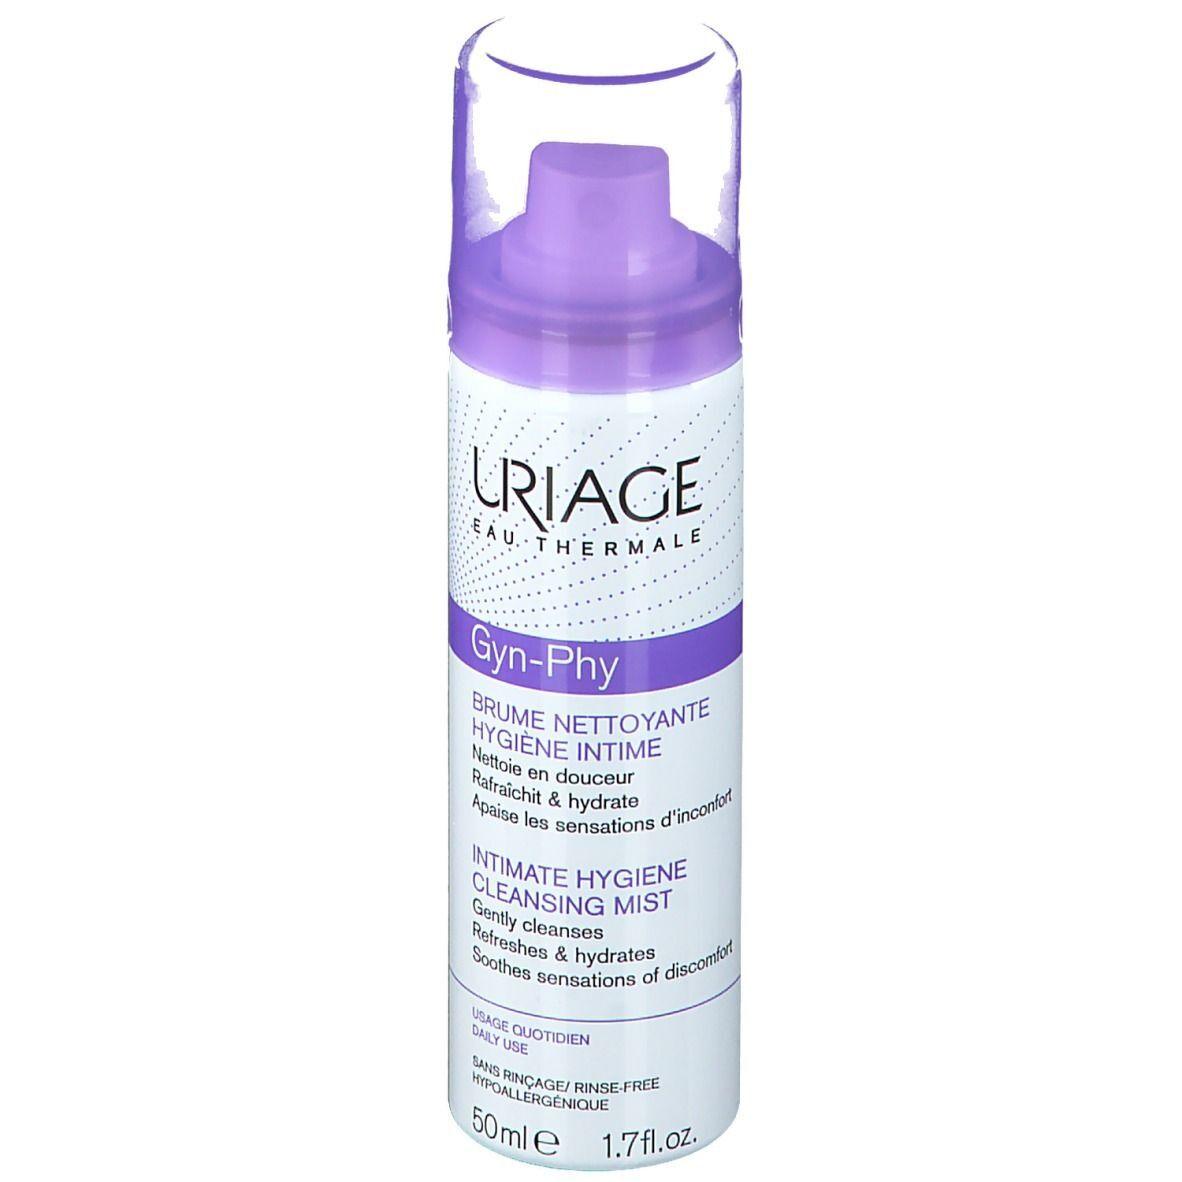 URIAGE Gyn-Phy Brune nettoyante hygiène intime ml spray